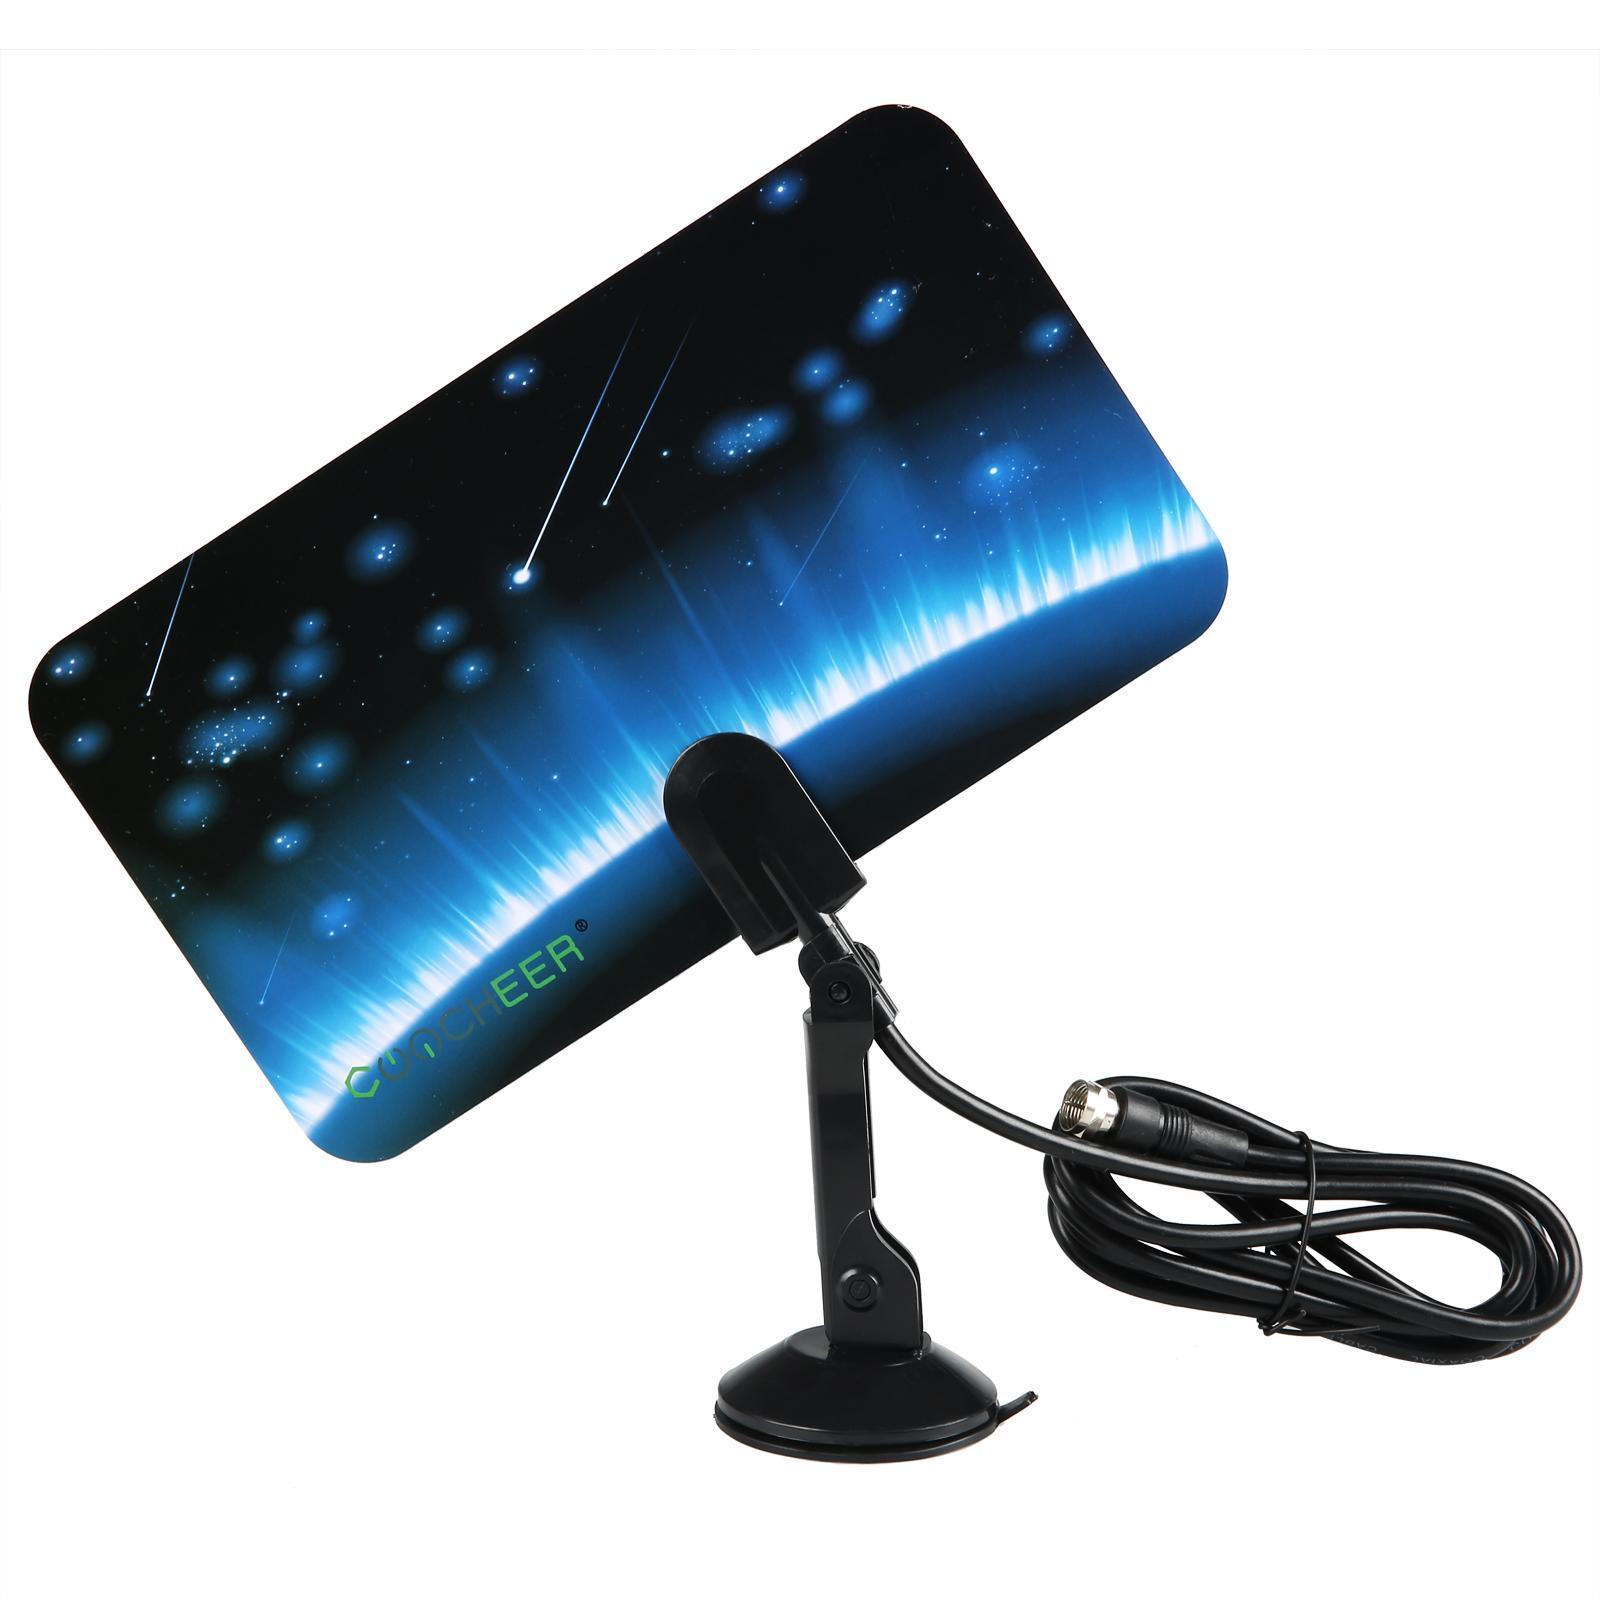 Digital TV Antenna Signal HDTV DTV Box Ready HD VHF UHF FM Stereo Flat Design 1